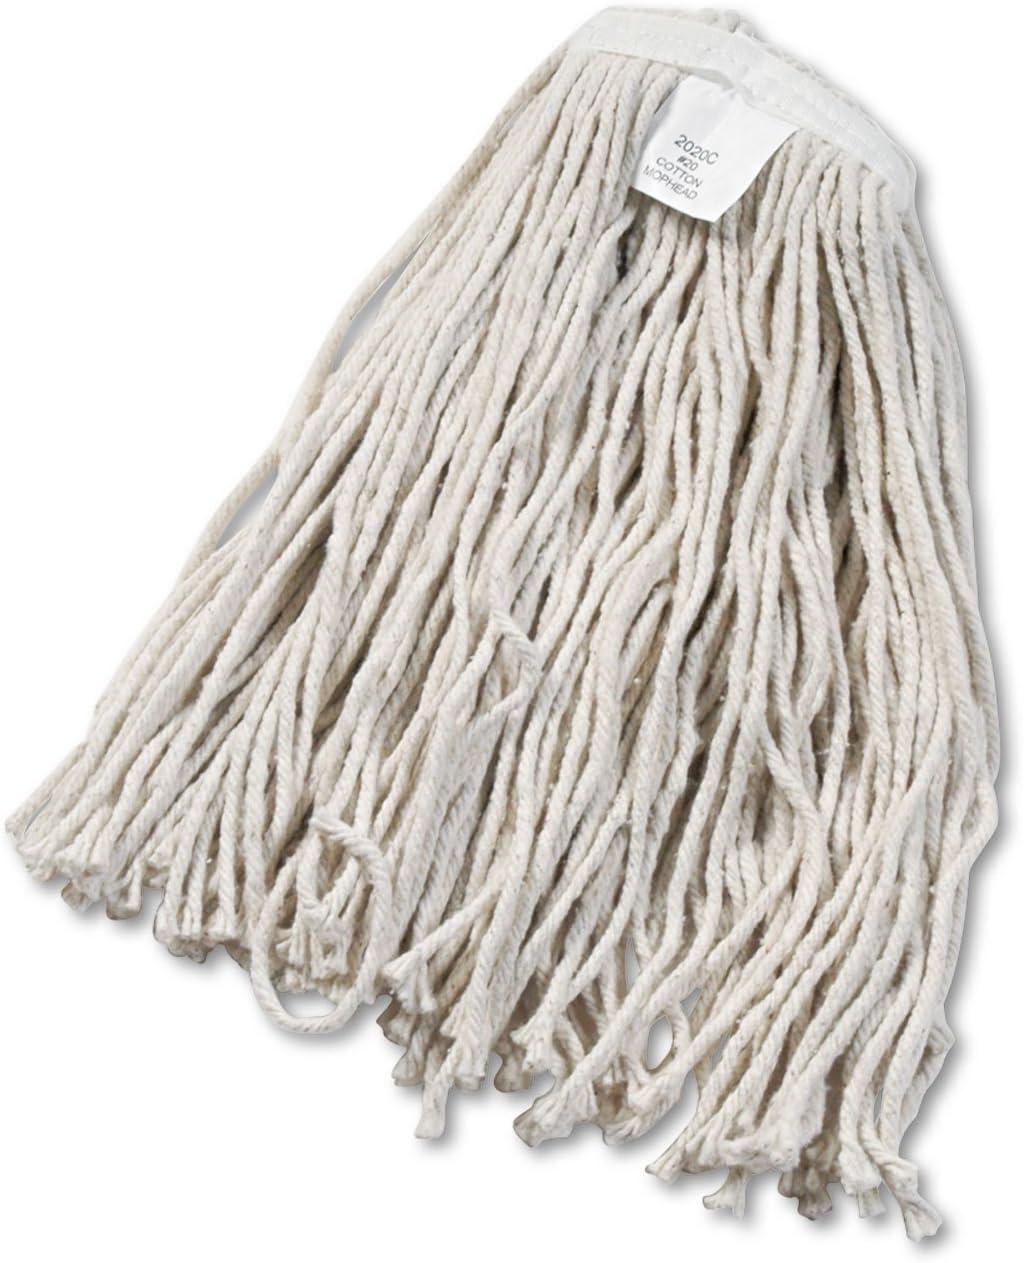 Amazon Com Unisan Cut End Wet Mop Head Cotton 20 Size White 2020c Mop Replacement Heads Office Products